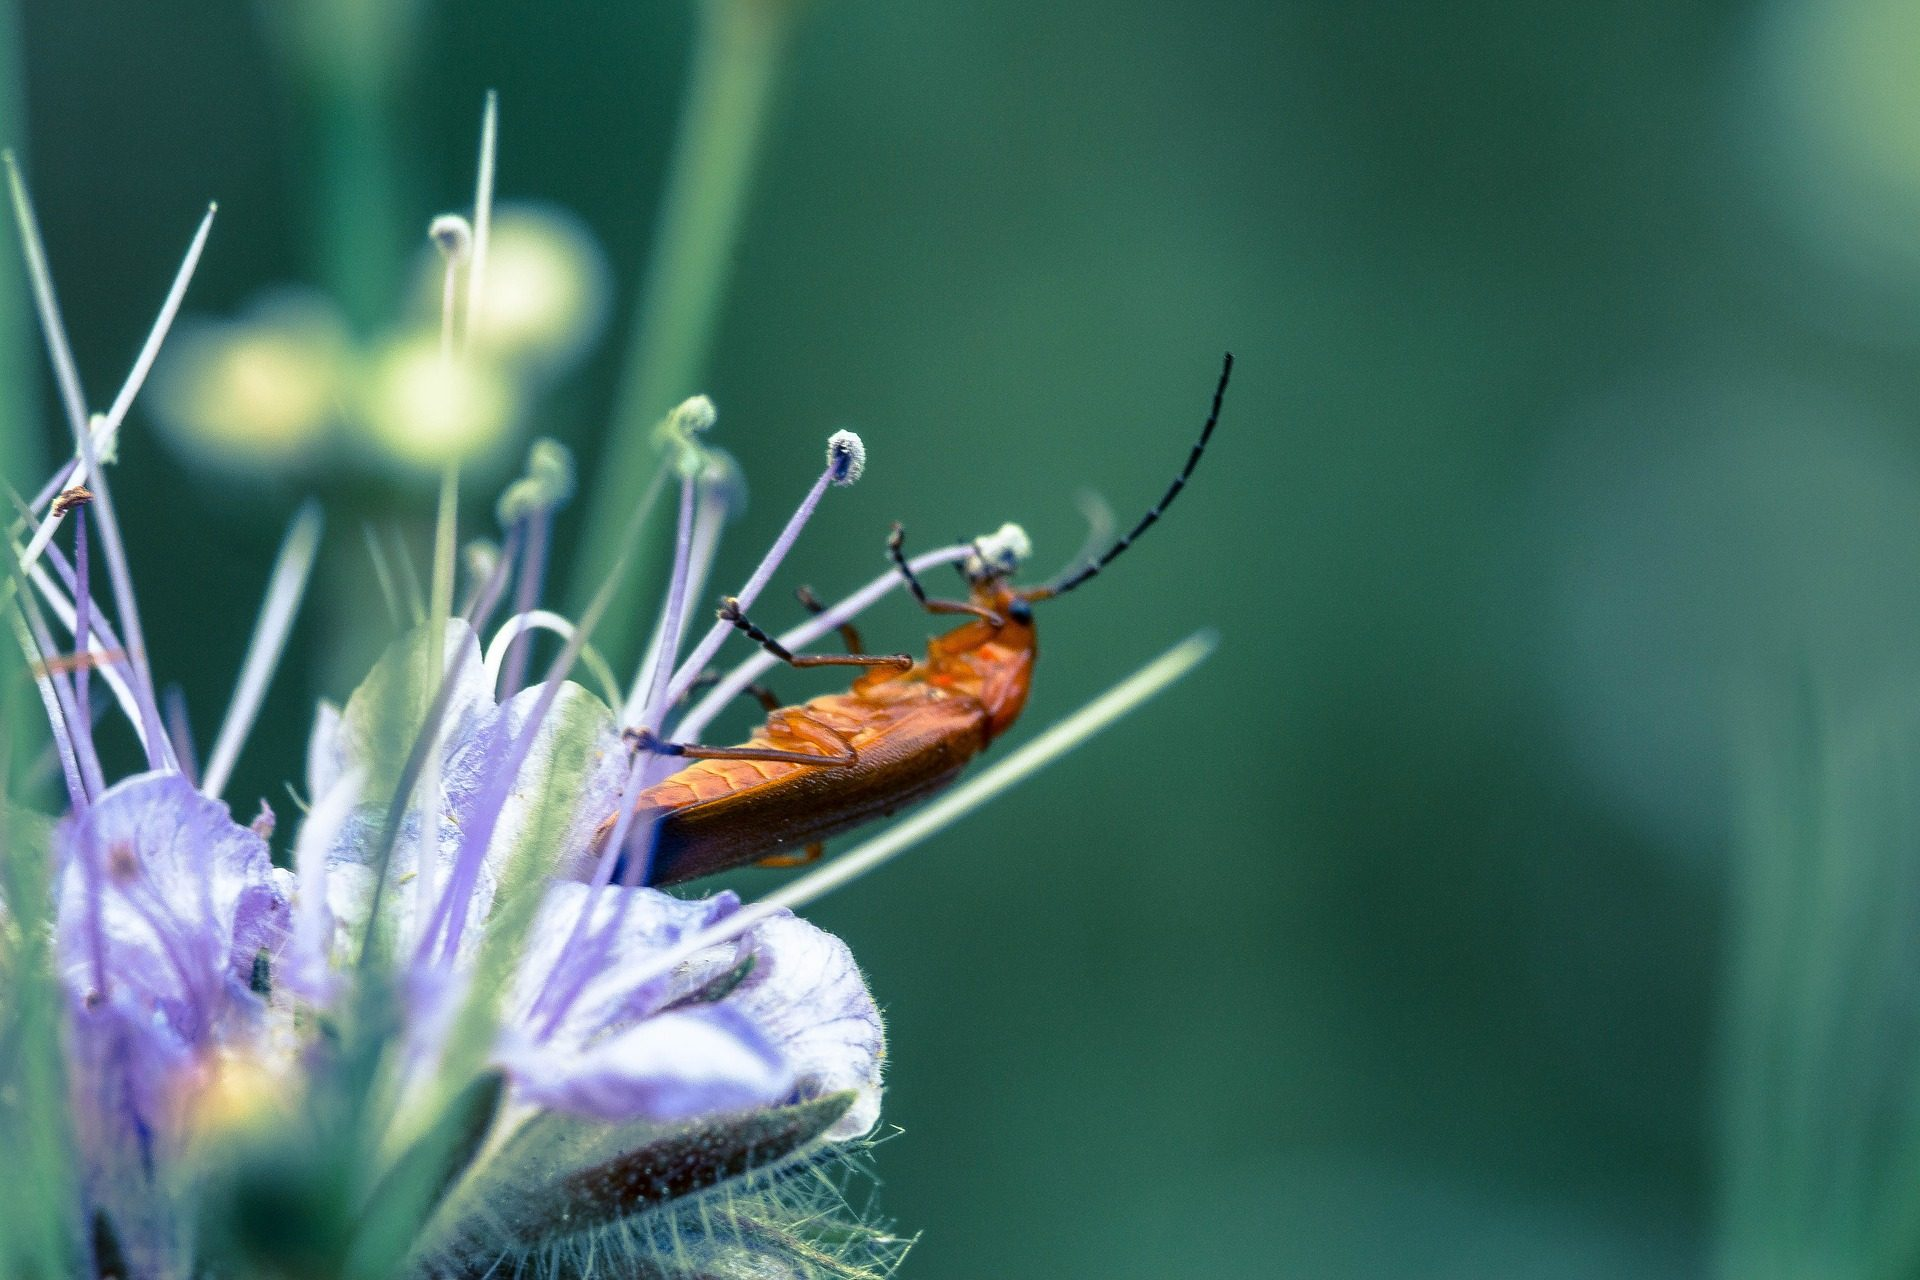 Beetle, insecte, bug, fleur, étamines, sur - Fonds d'écran HD - Professor-falken.com